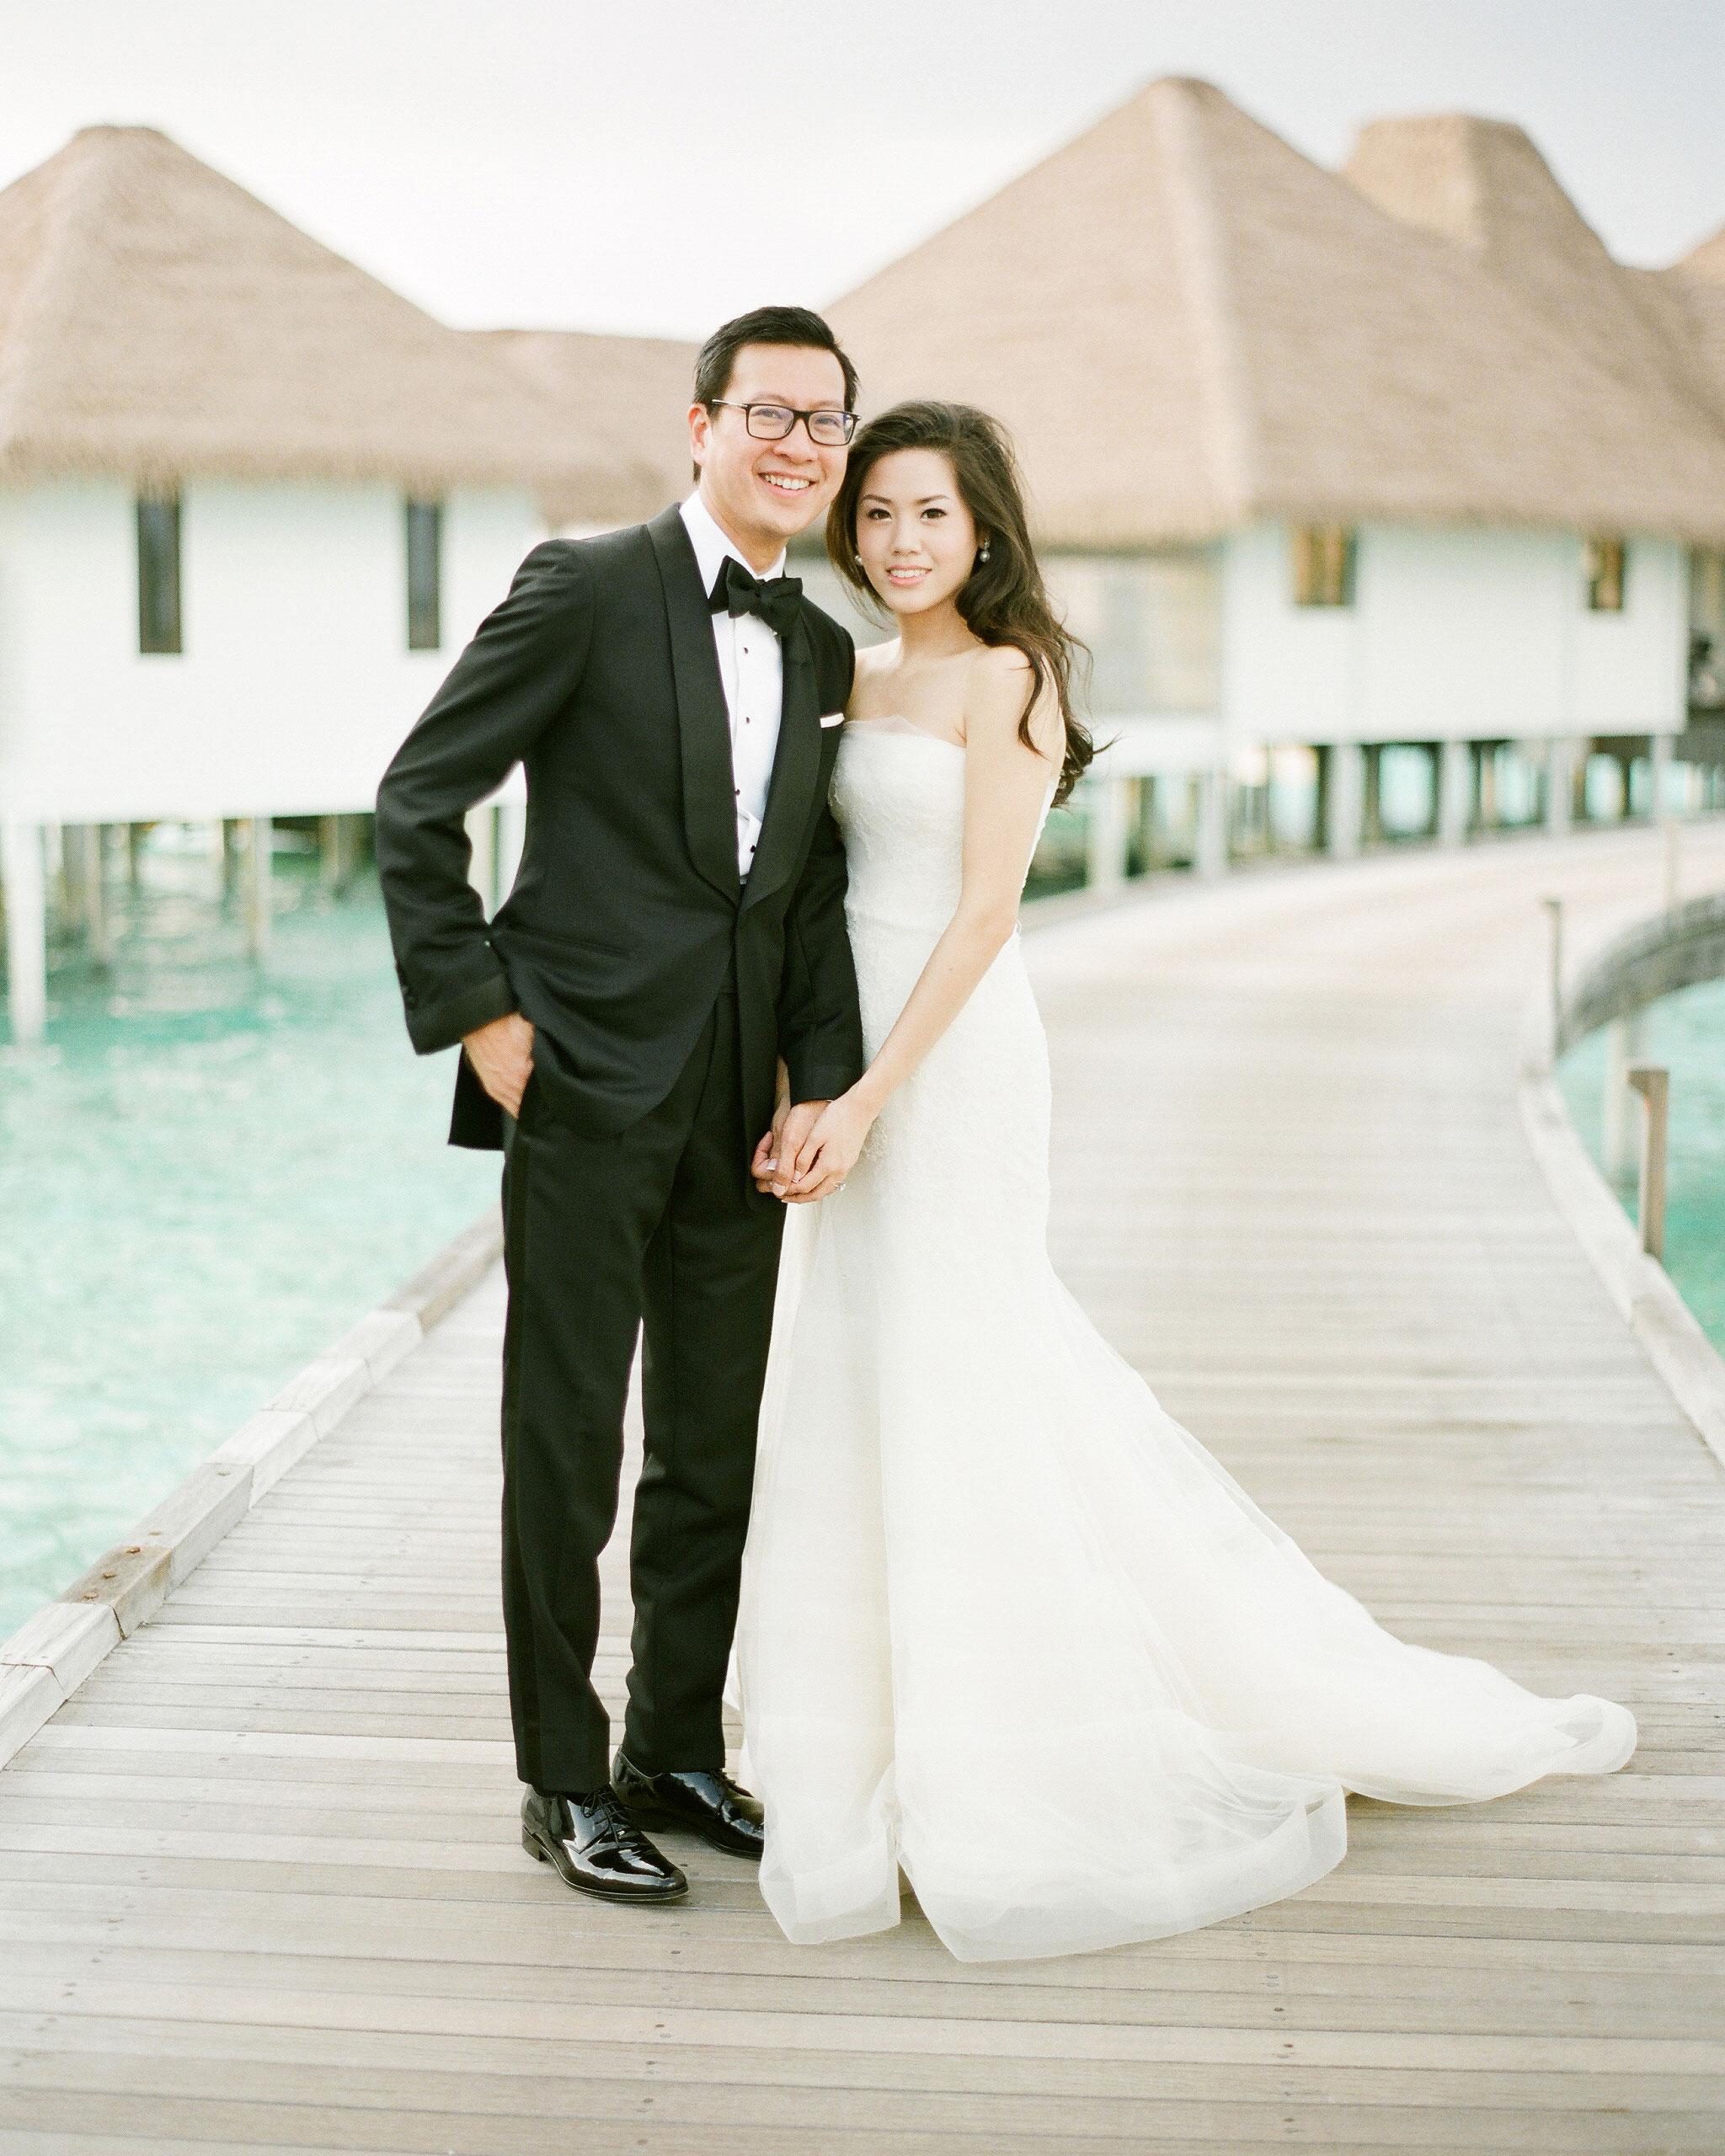 peony-richard-wedding-maldives-boardwalk-couple-0136-s112383.jpg